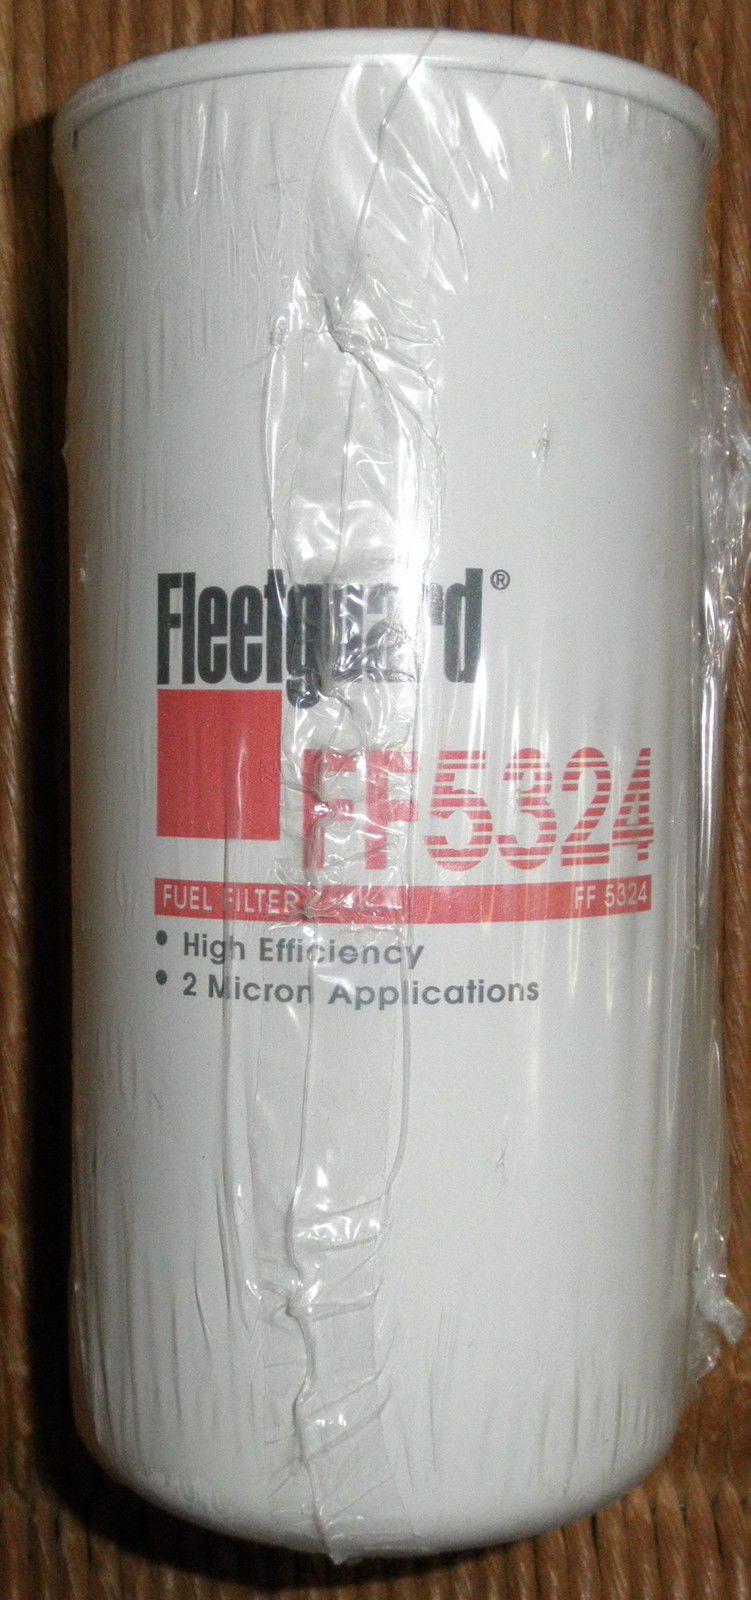 medium resolution of fleetguard ff5324 diesel fuel filter cat engines wix 33626 1r0751 1r 0751 dp equipment llc